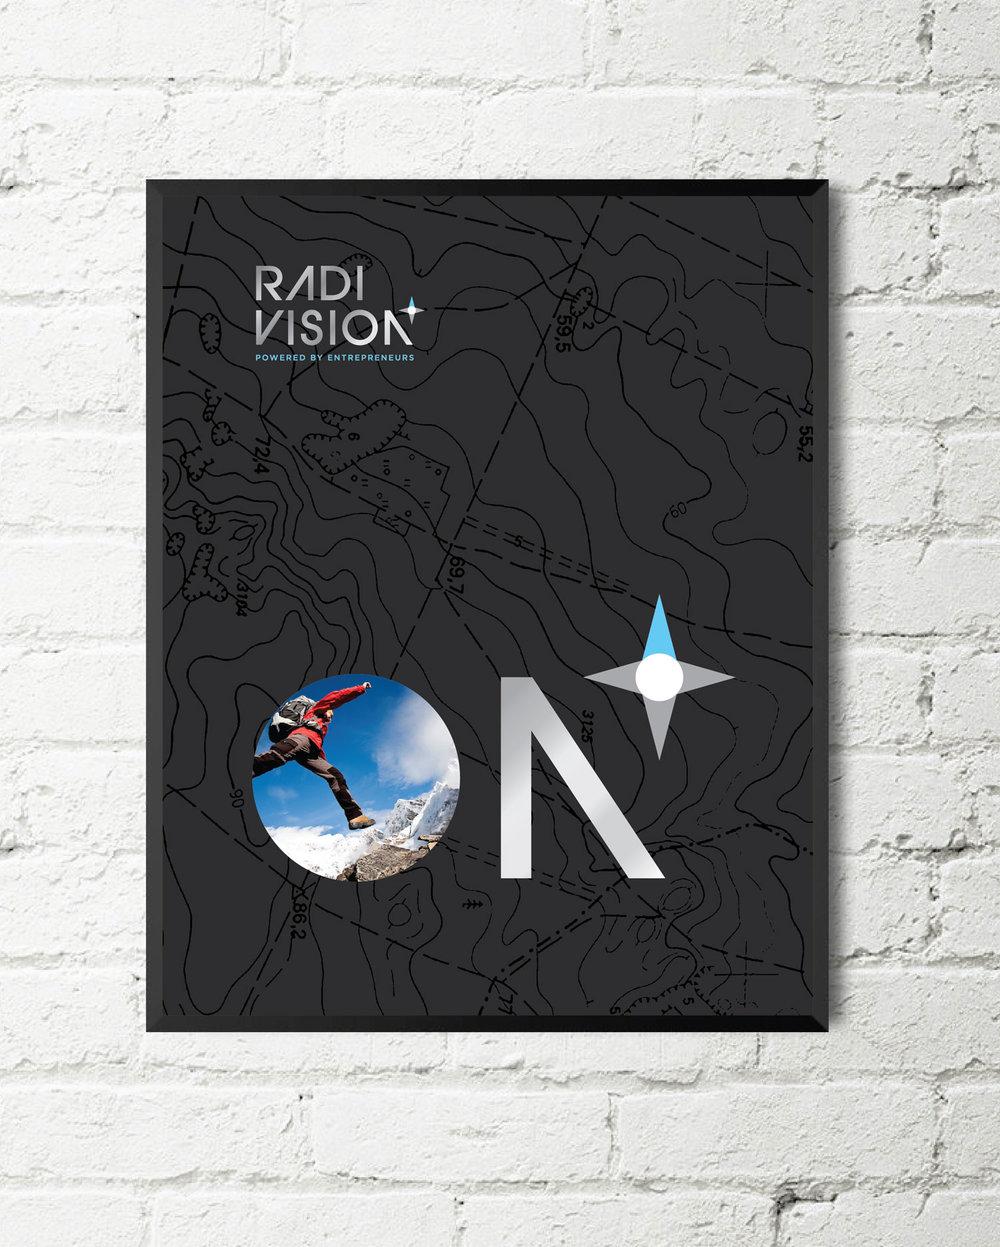 Radivision-Rebrand-by-Yurika-Creative-10.jpg